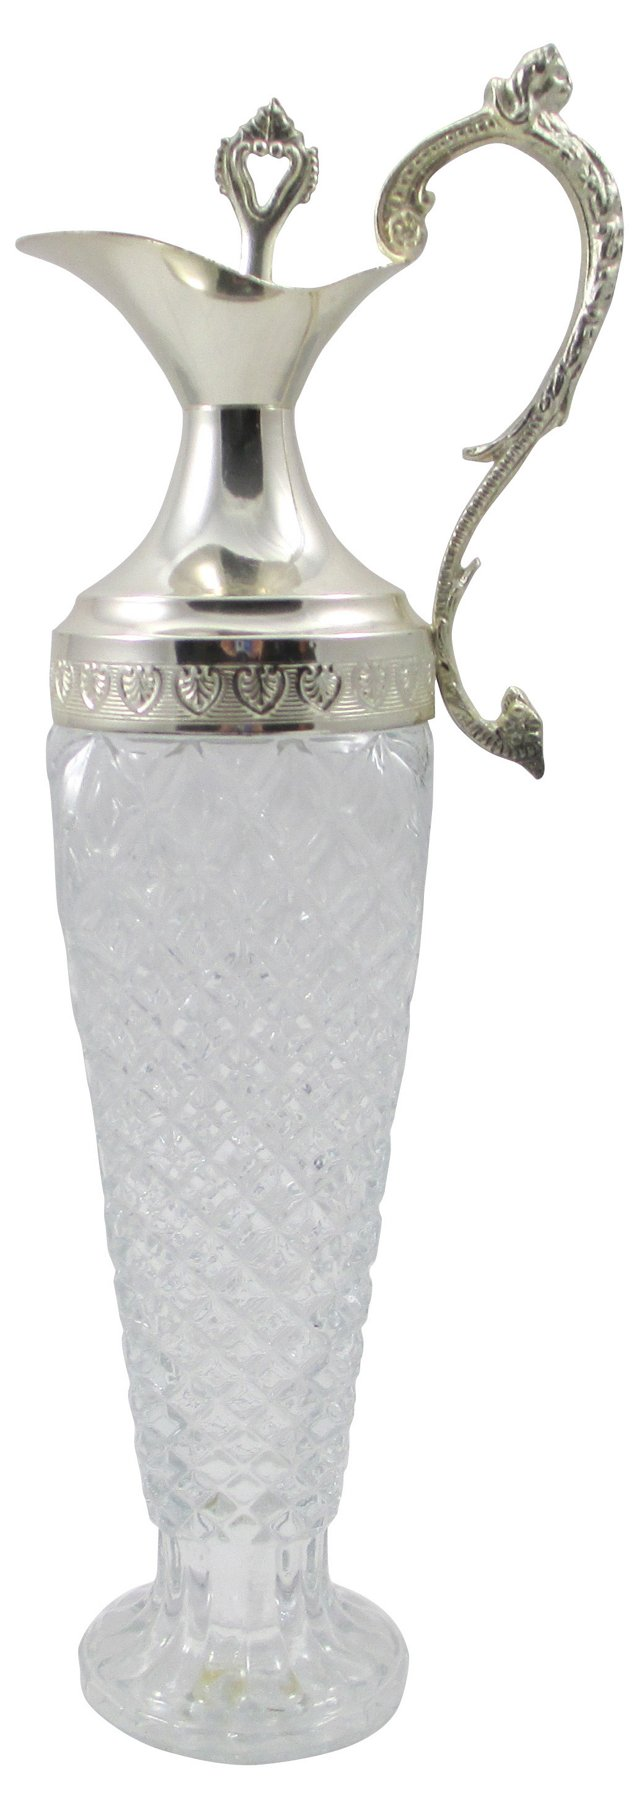 Italian Cut-Glass & Silver Decanter